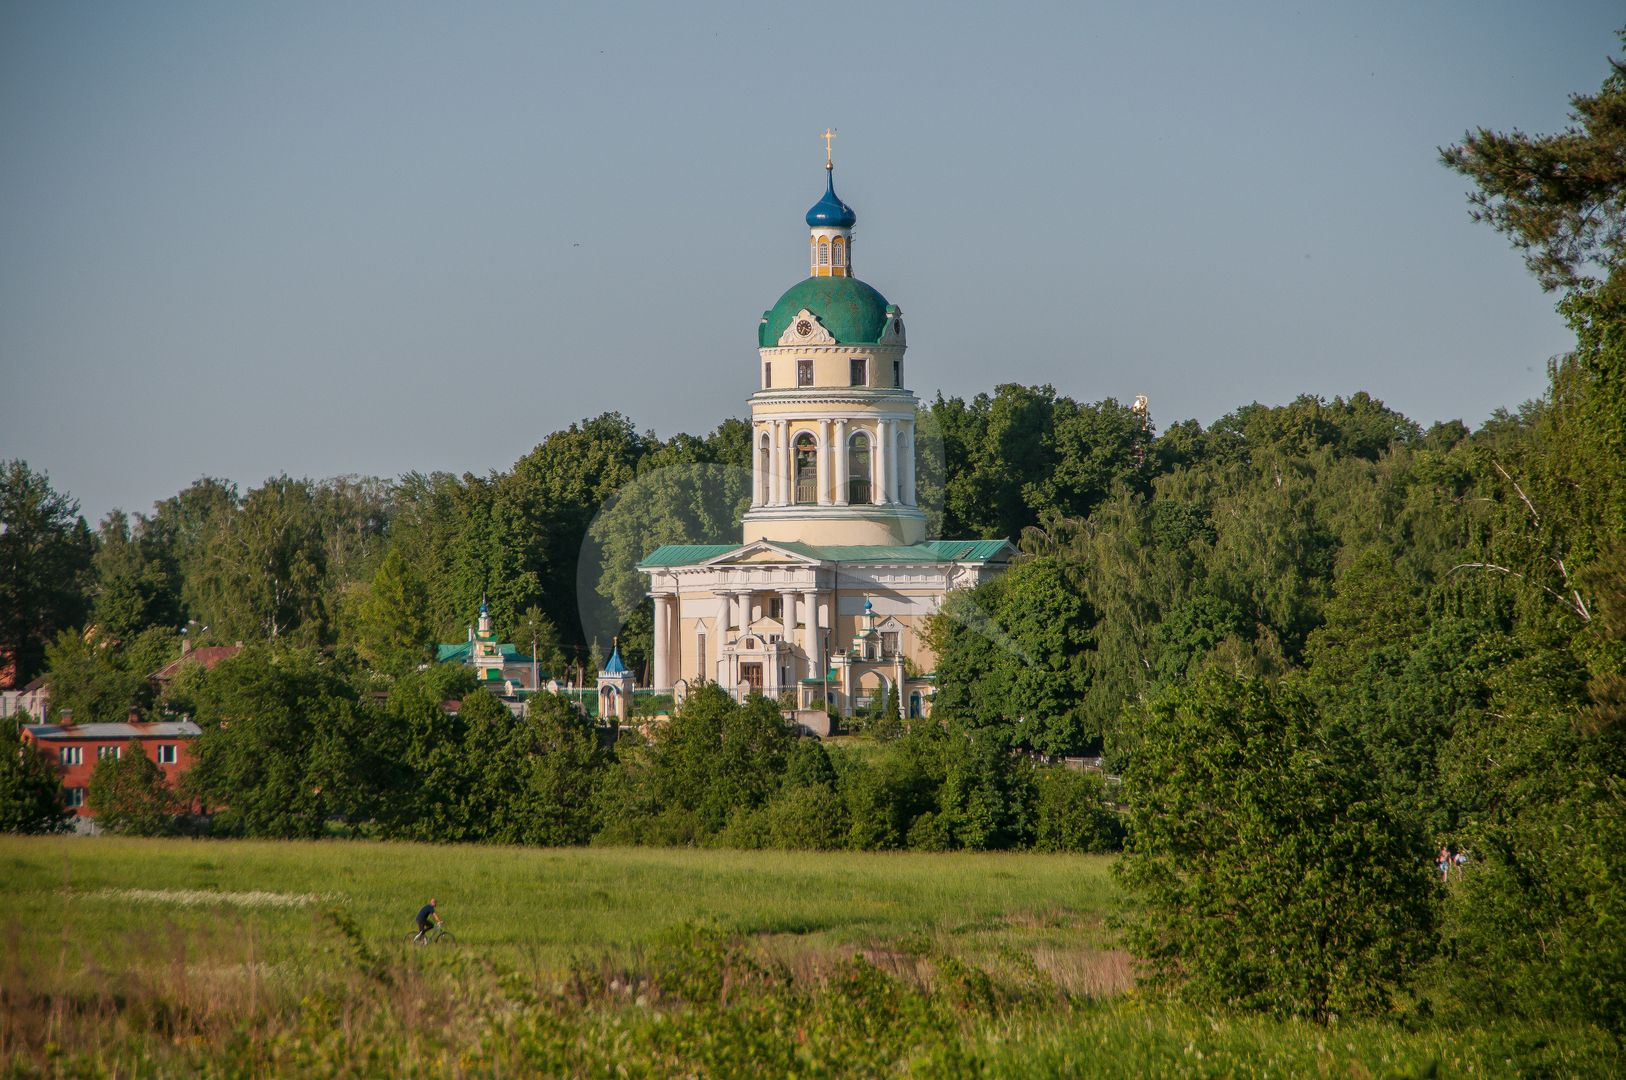 Церковь Николая Чудотворца, 1823 г., усадьба Гребнево, ХVIII-ХIХ вв.